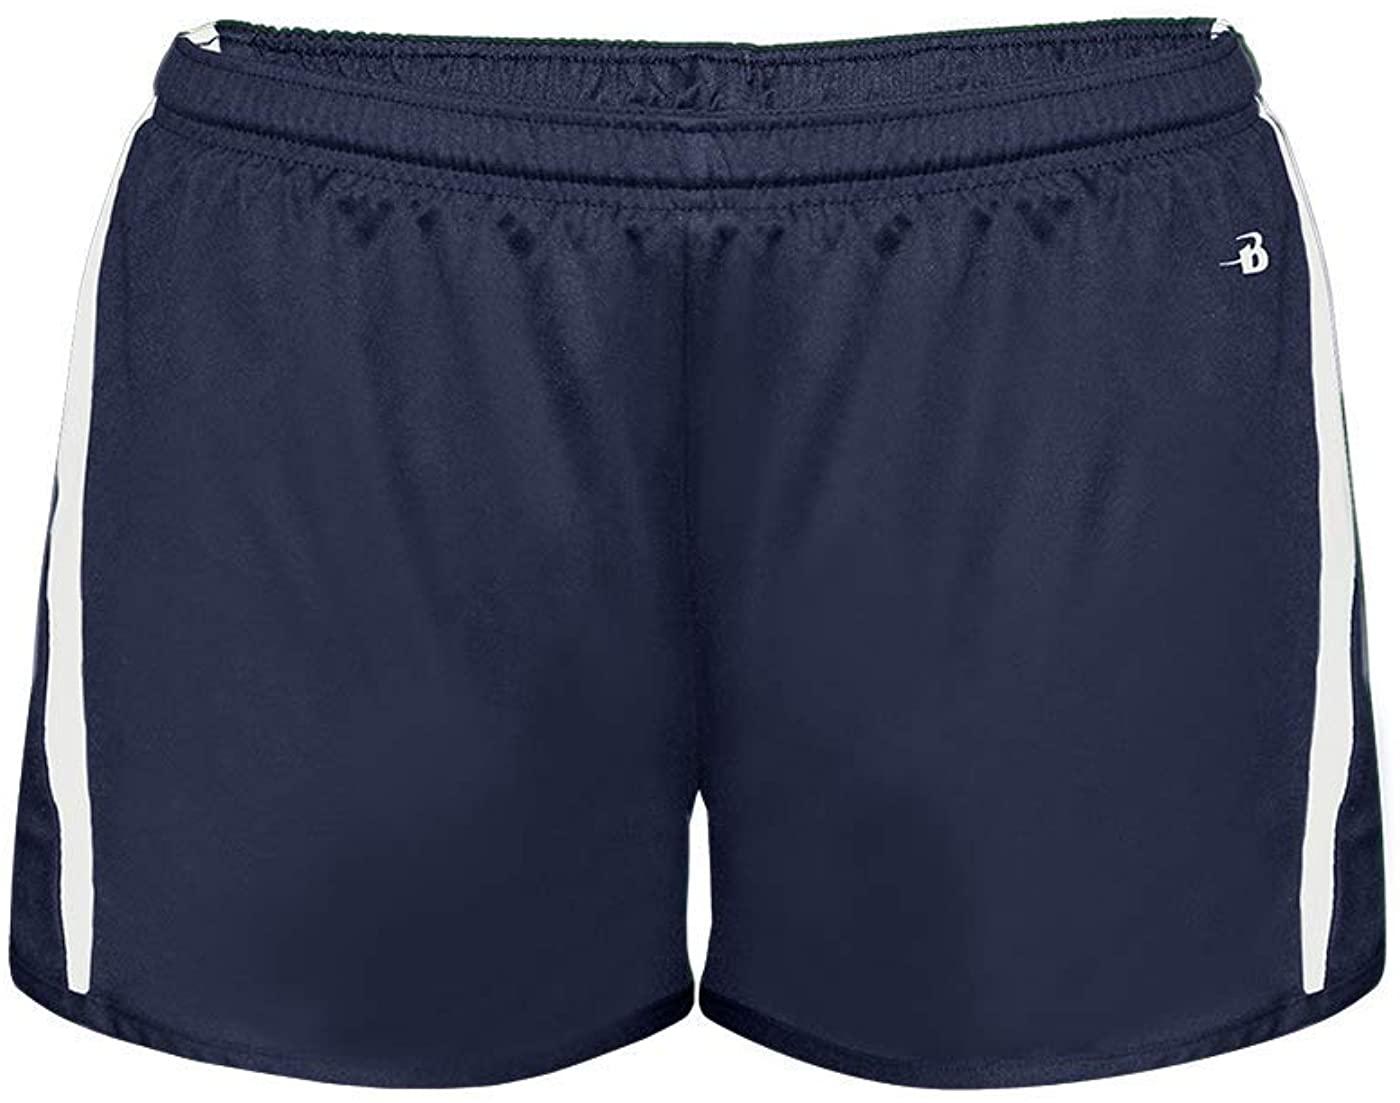 Badger Sport Navy/White Womens XL Wicking Running Shorts